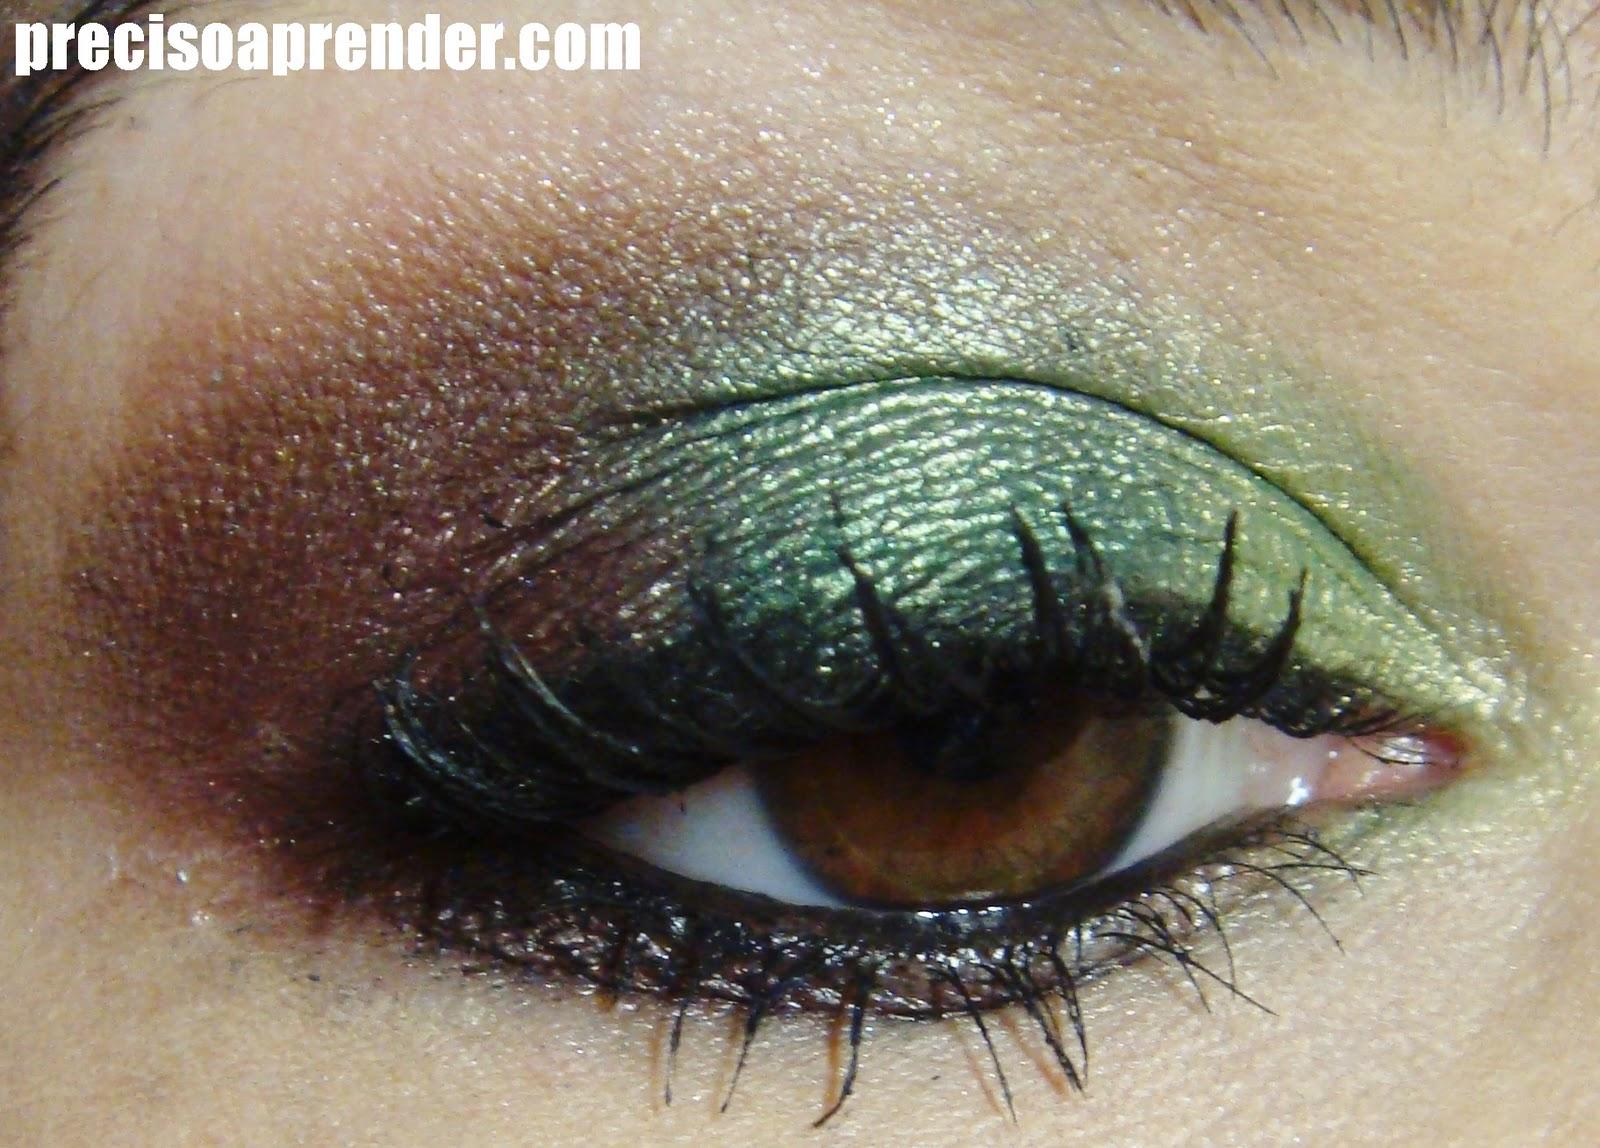 http://2.bp.blogspot.com/-uCeJU985WfE/Tw2yZ8LesAI/AAAAAAAABz8/fc2ZAdgceww/s1600/maquiagem+degrad%25C3%25AA+verde+com+marrom+sombra+3d+jasmyne.JPG